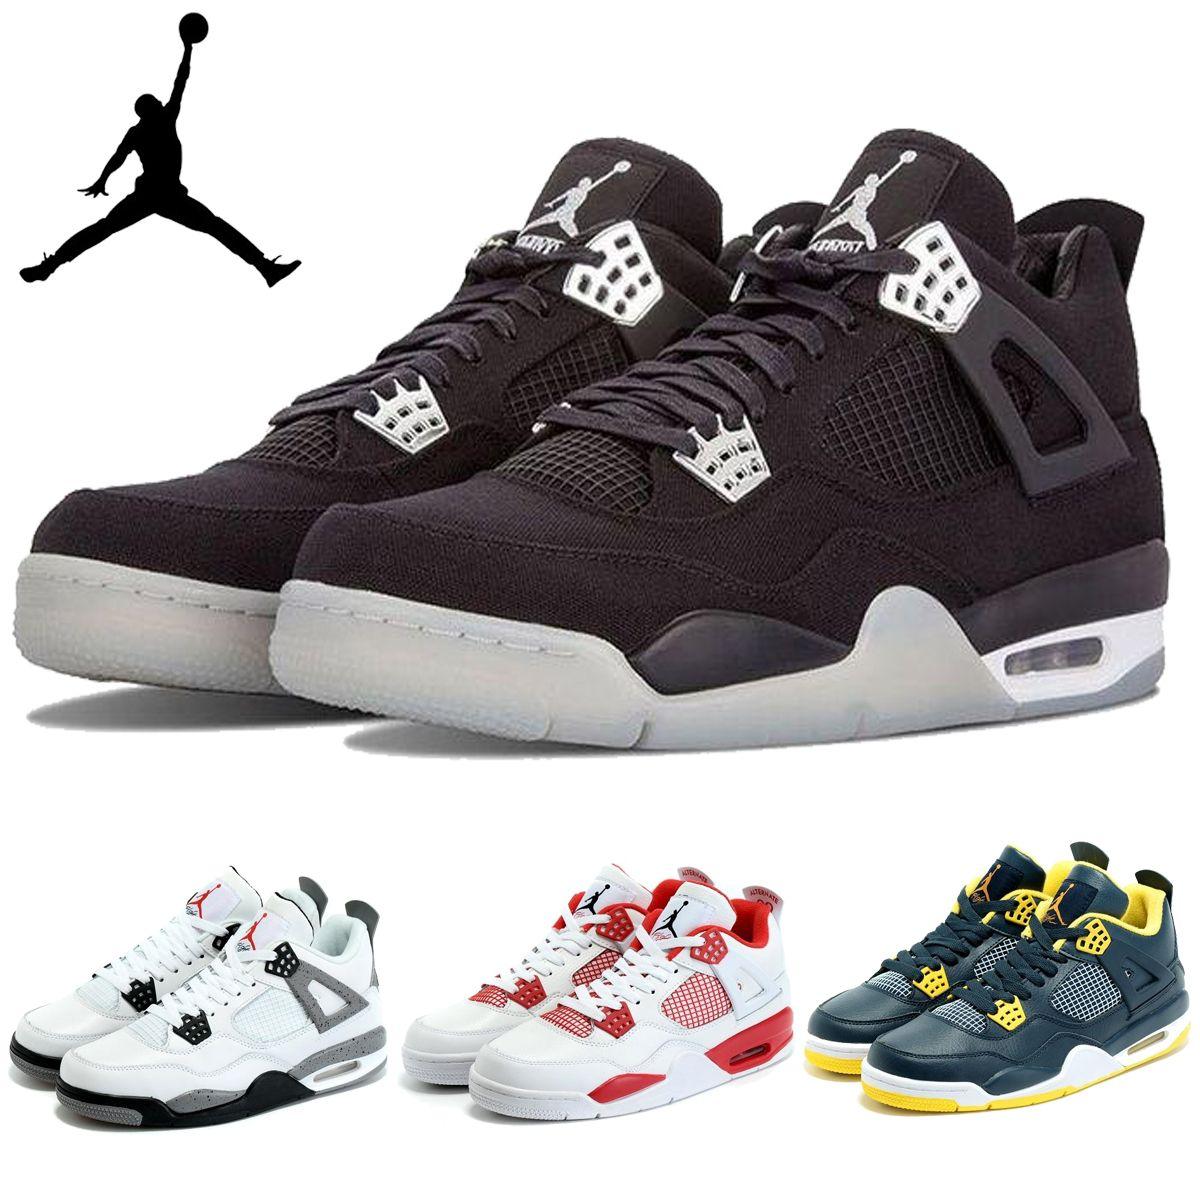 size 40 e71ba f743d Acquista Nike Air Jordan 4 IV Retro Scarpe Alternativo 89 Bianco Nero  Palestra Rosso Mens Basketball Sport AJ4 Jordan Shoes Jordan J4 Sneakers A   101.53 Dal ...